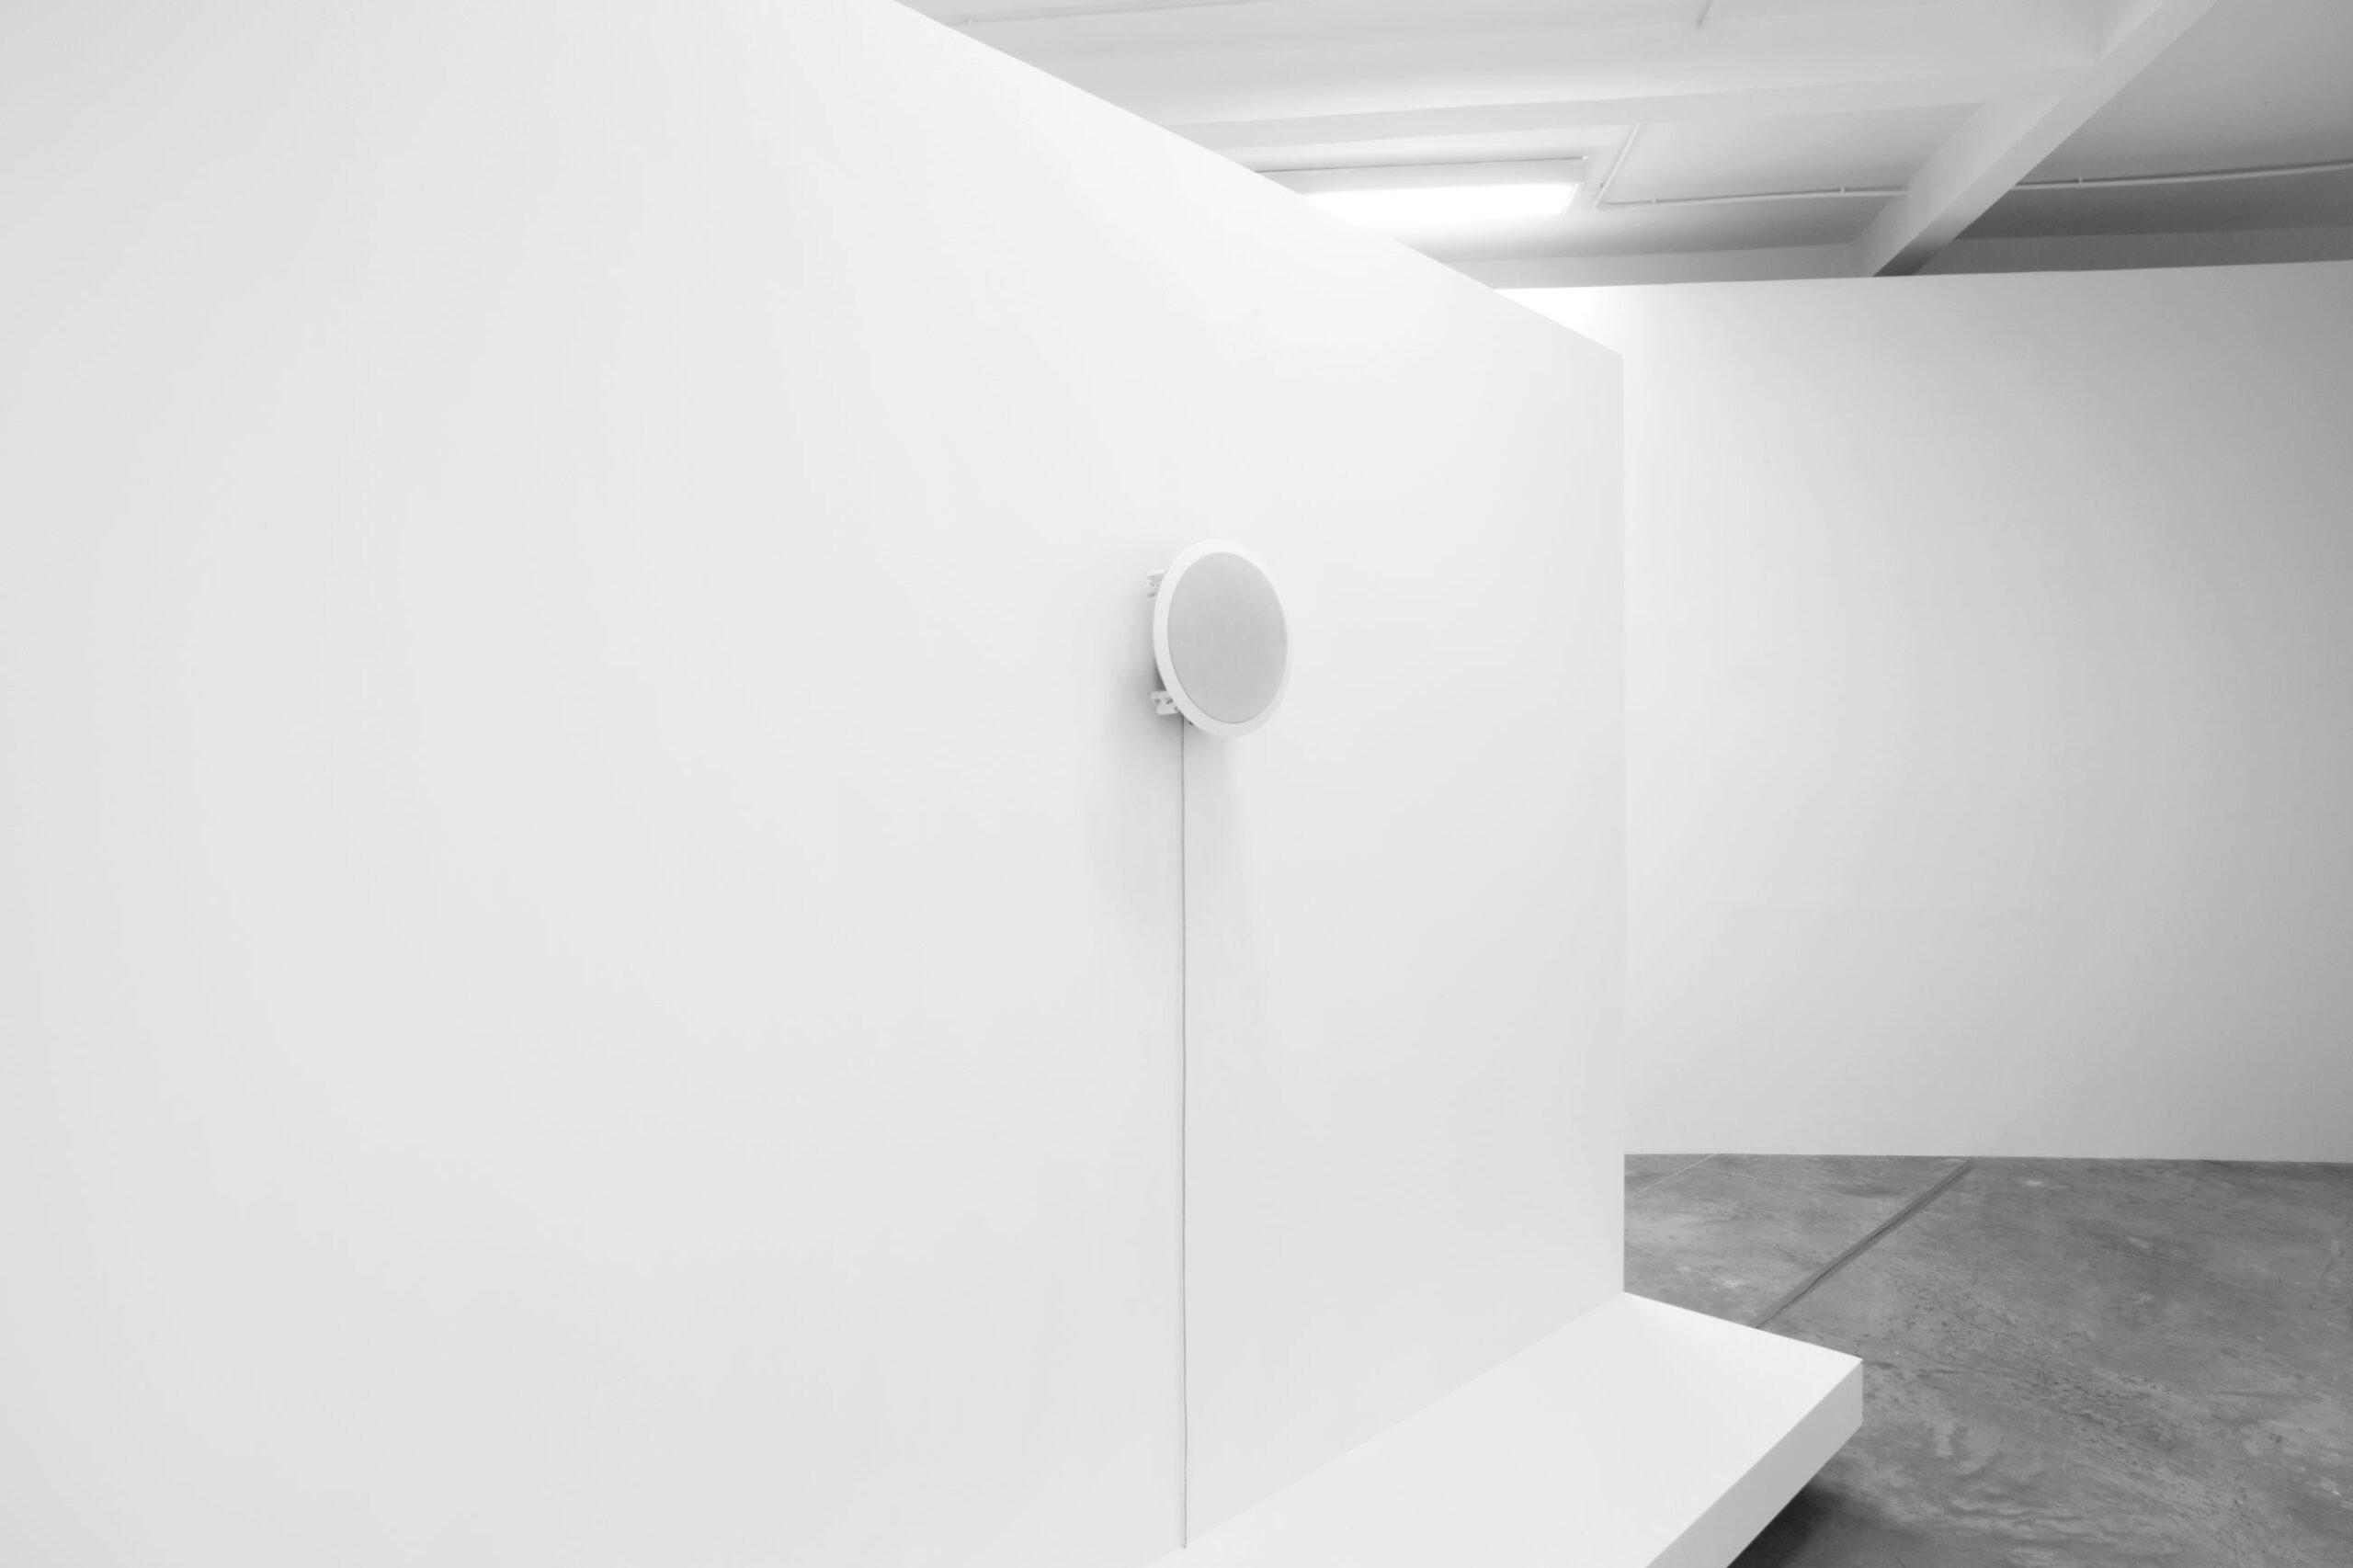 Jacek Doroszenko - Aberration maker, exhibition view 2